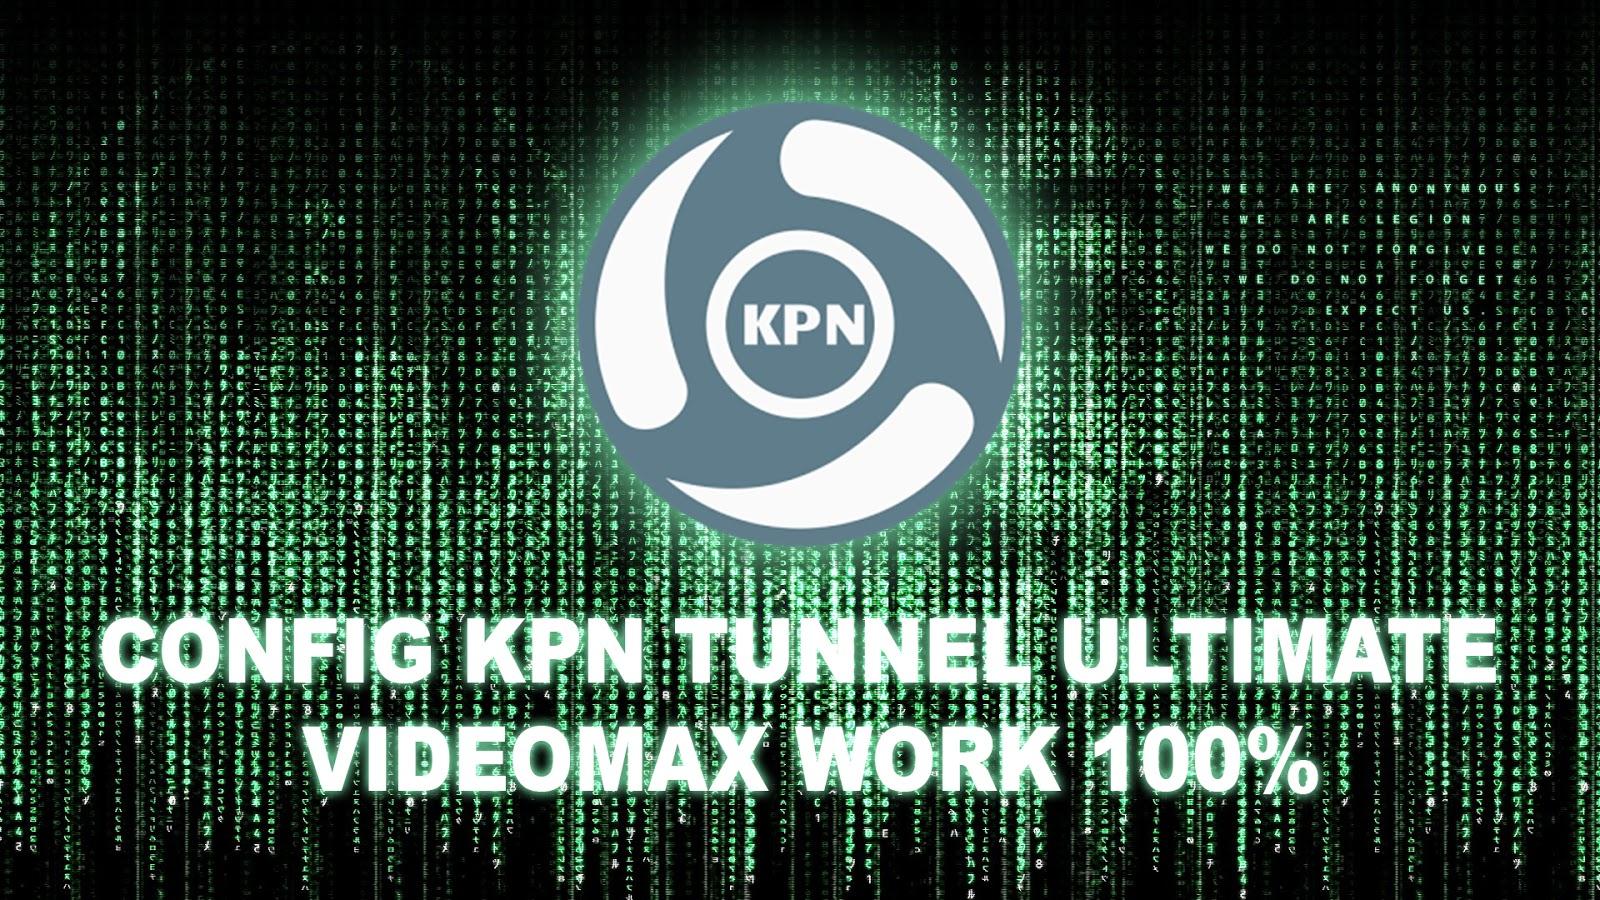 Config KPN Tunnel Ultimate Videomax Telkomsel Work 100% 2018